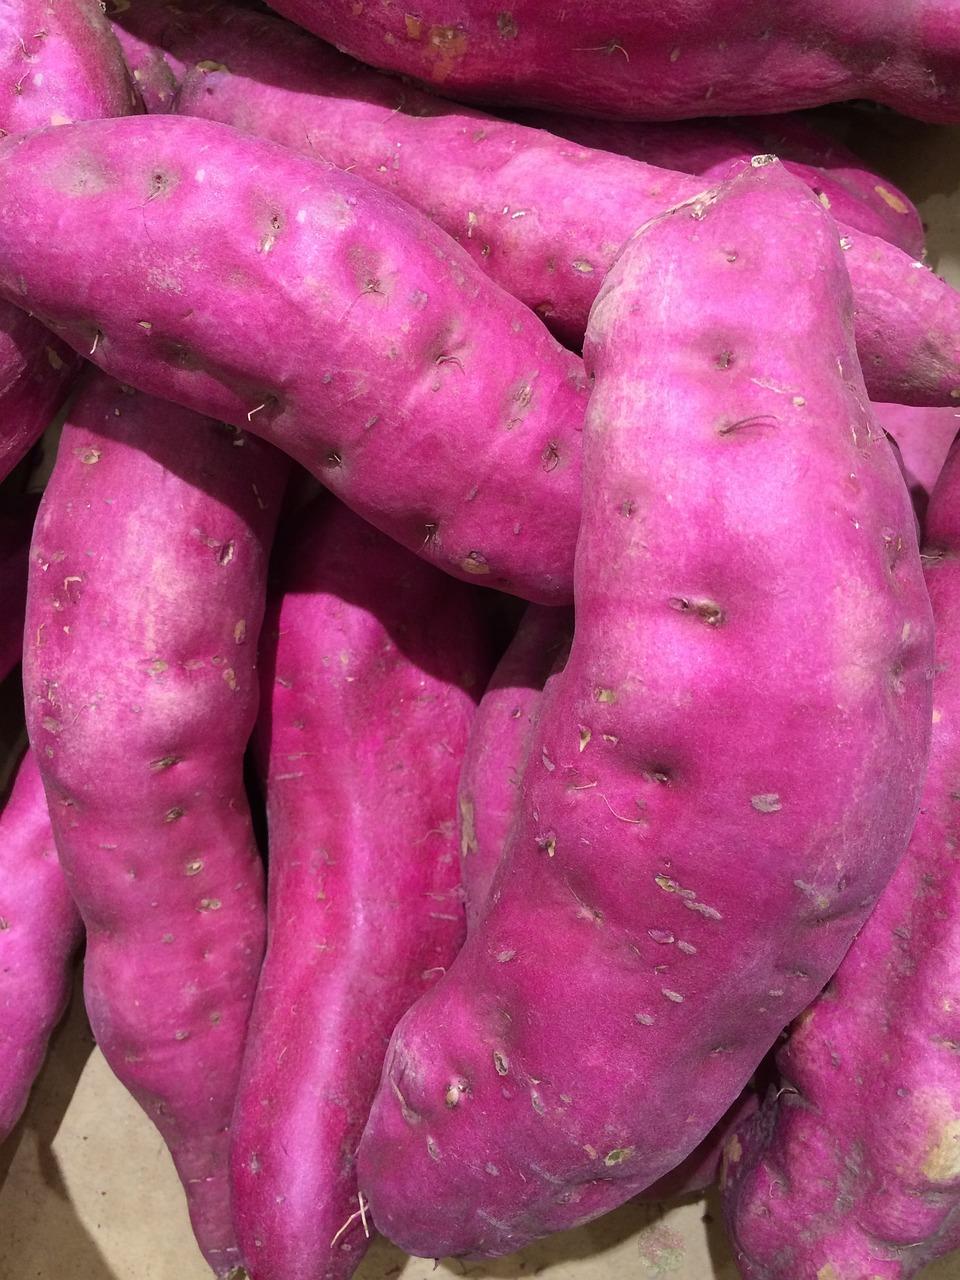 Sweet Potato Purple Seiyu Ltd - Free photo on Pixabay